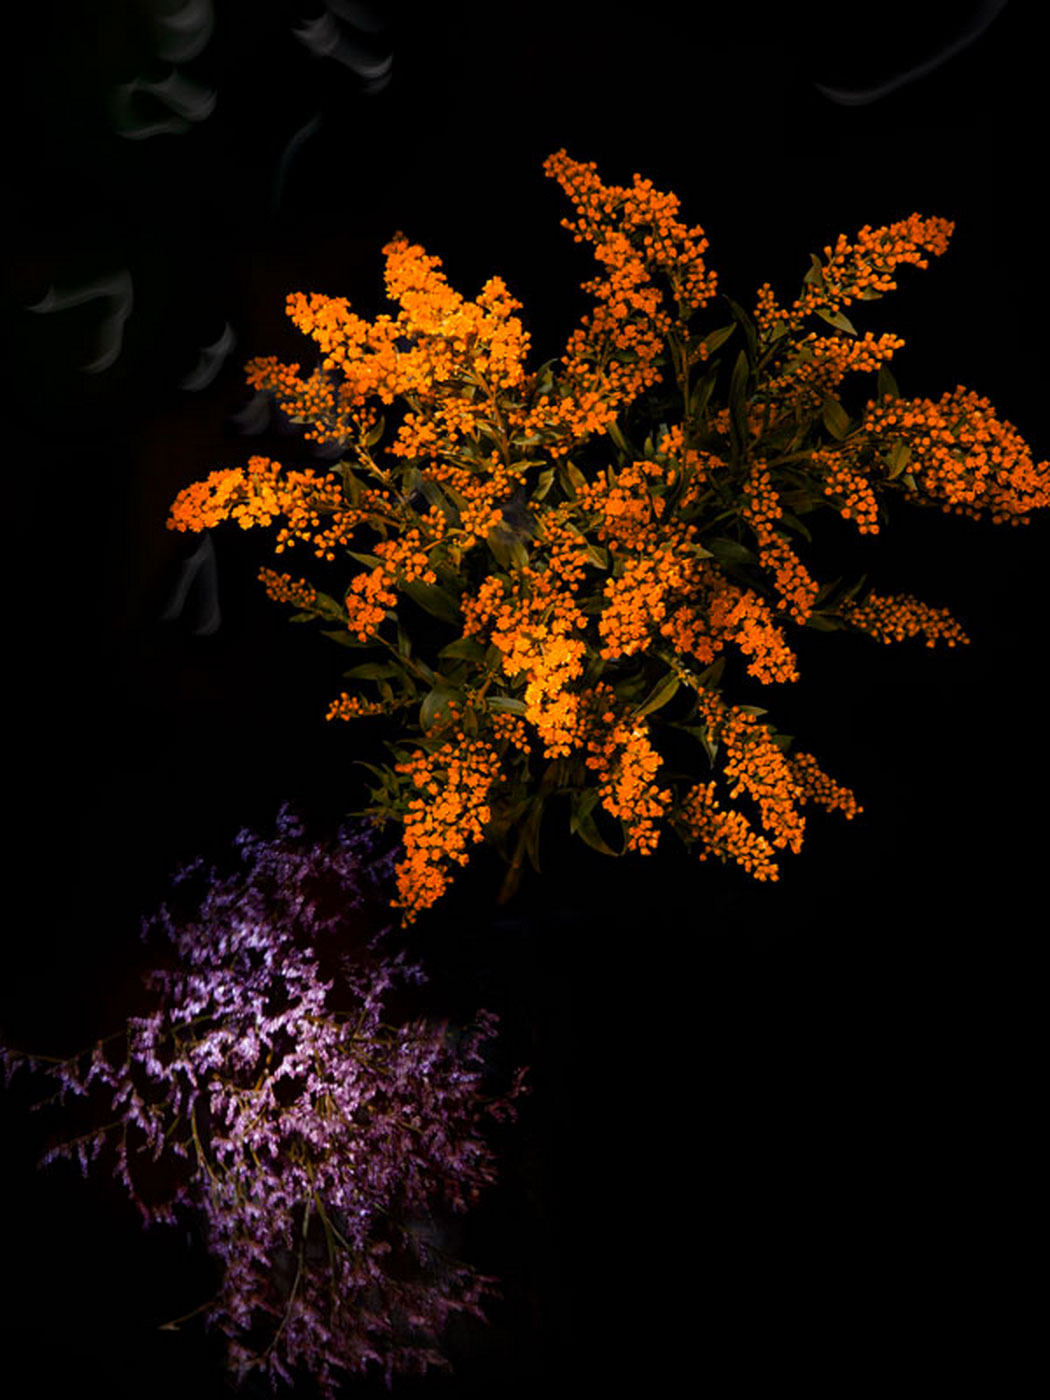 sarah-illenberger-flowerwork-05-1.jpg